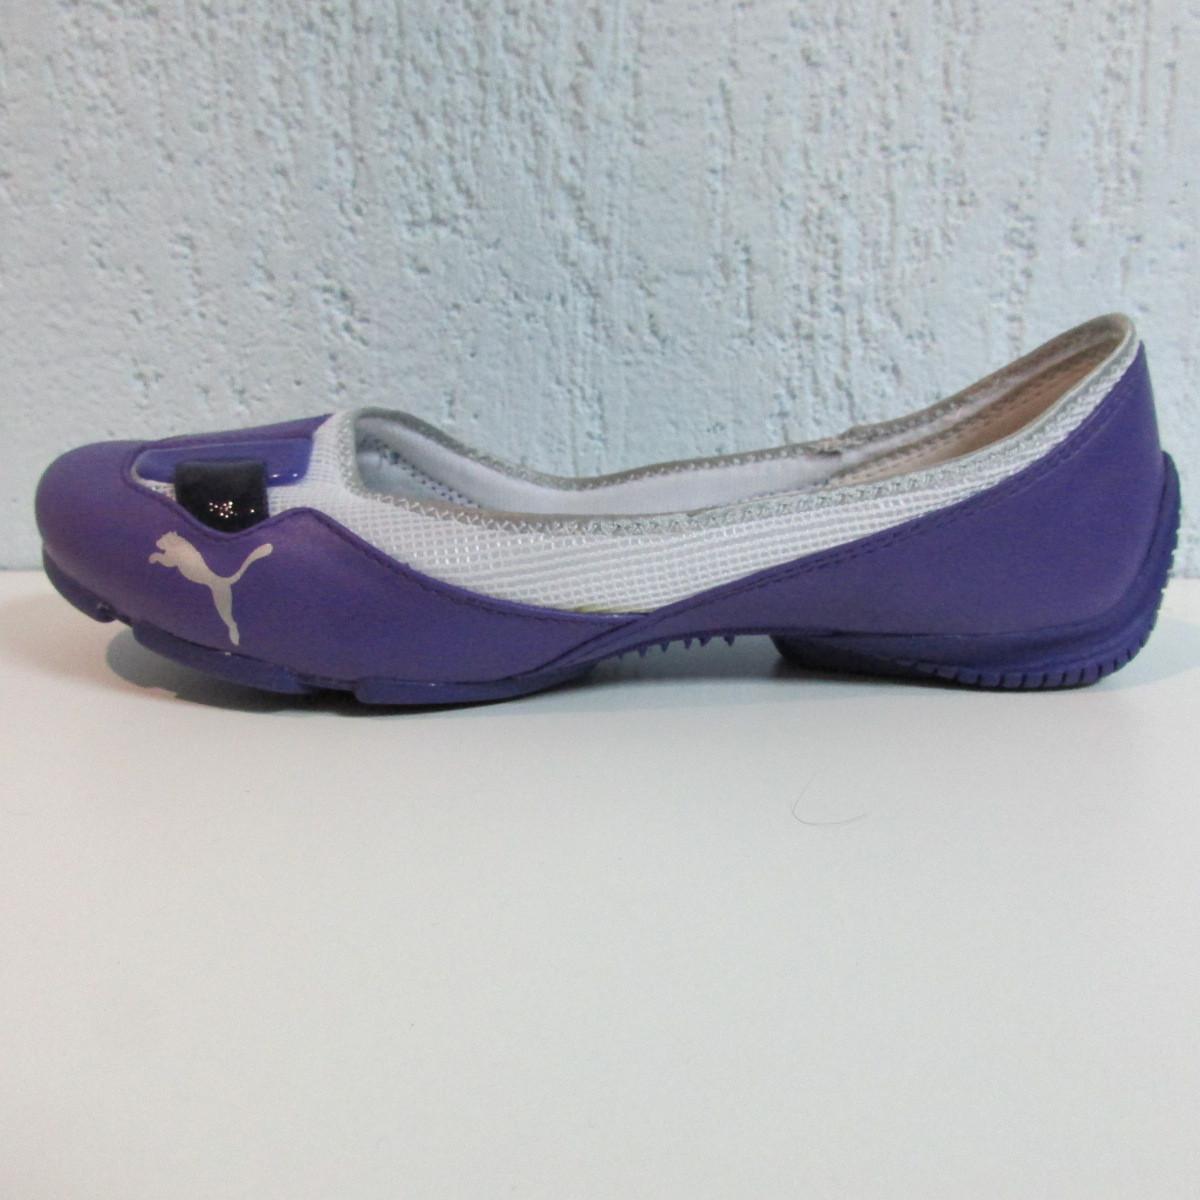 266bd7a41cee Балетки женские фиолетовые с белым Puma 303405-04 оригинал код 124А -  Интернет-магазин